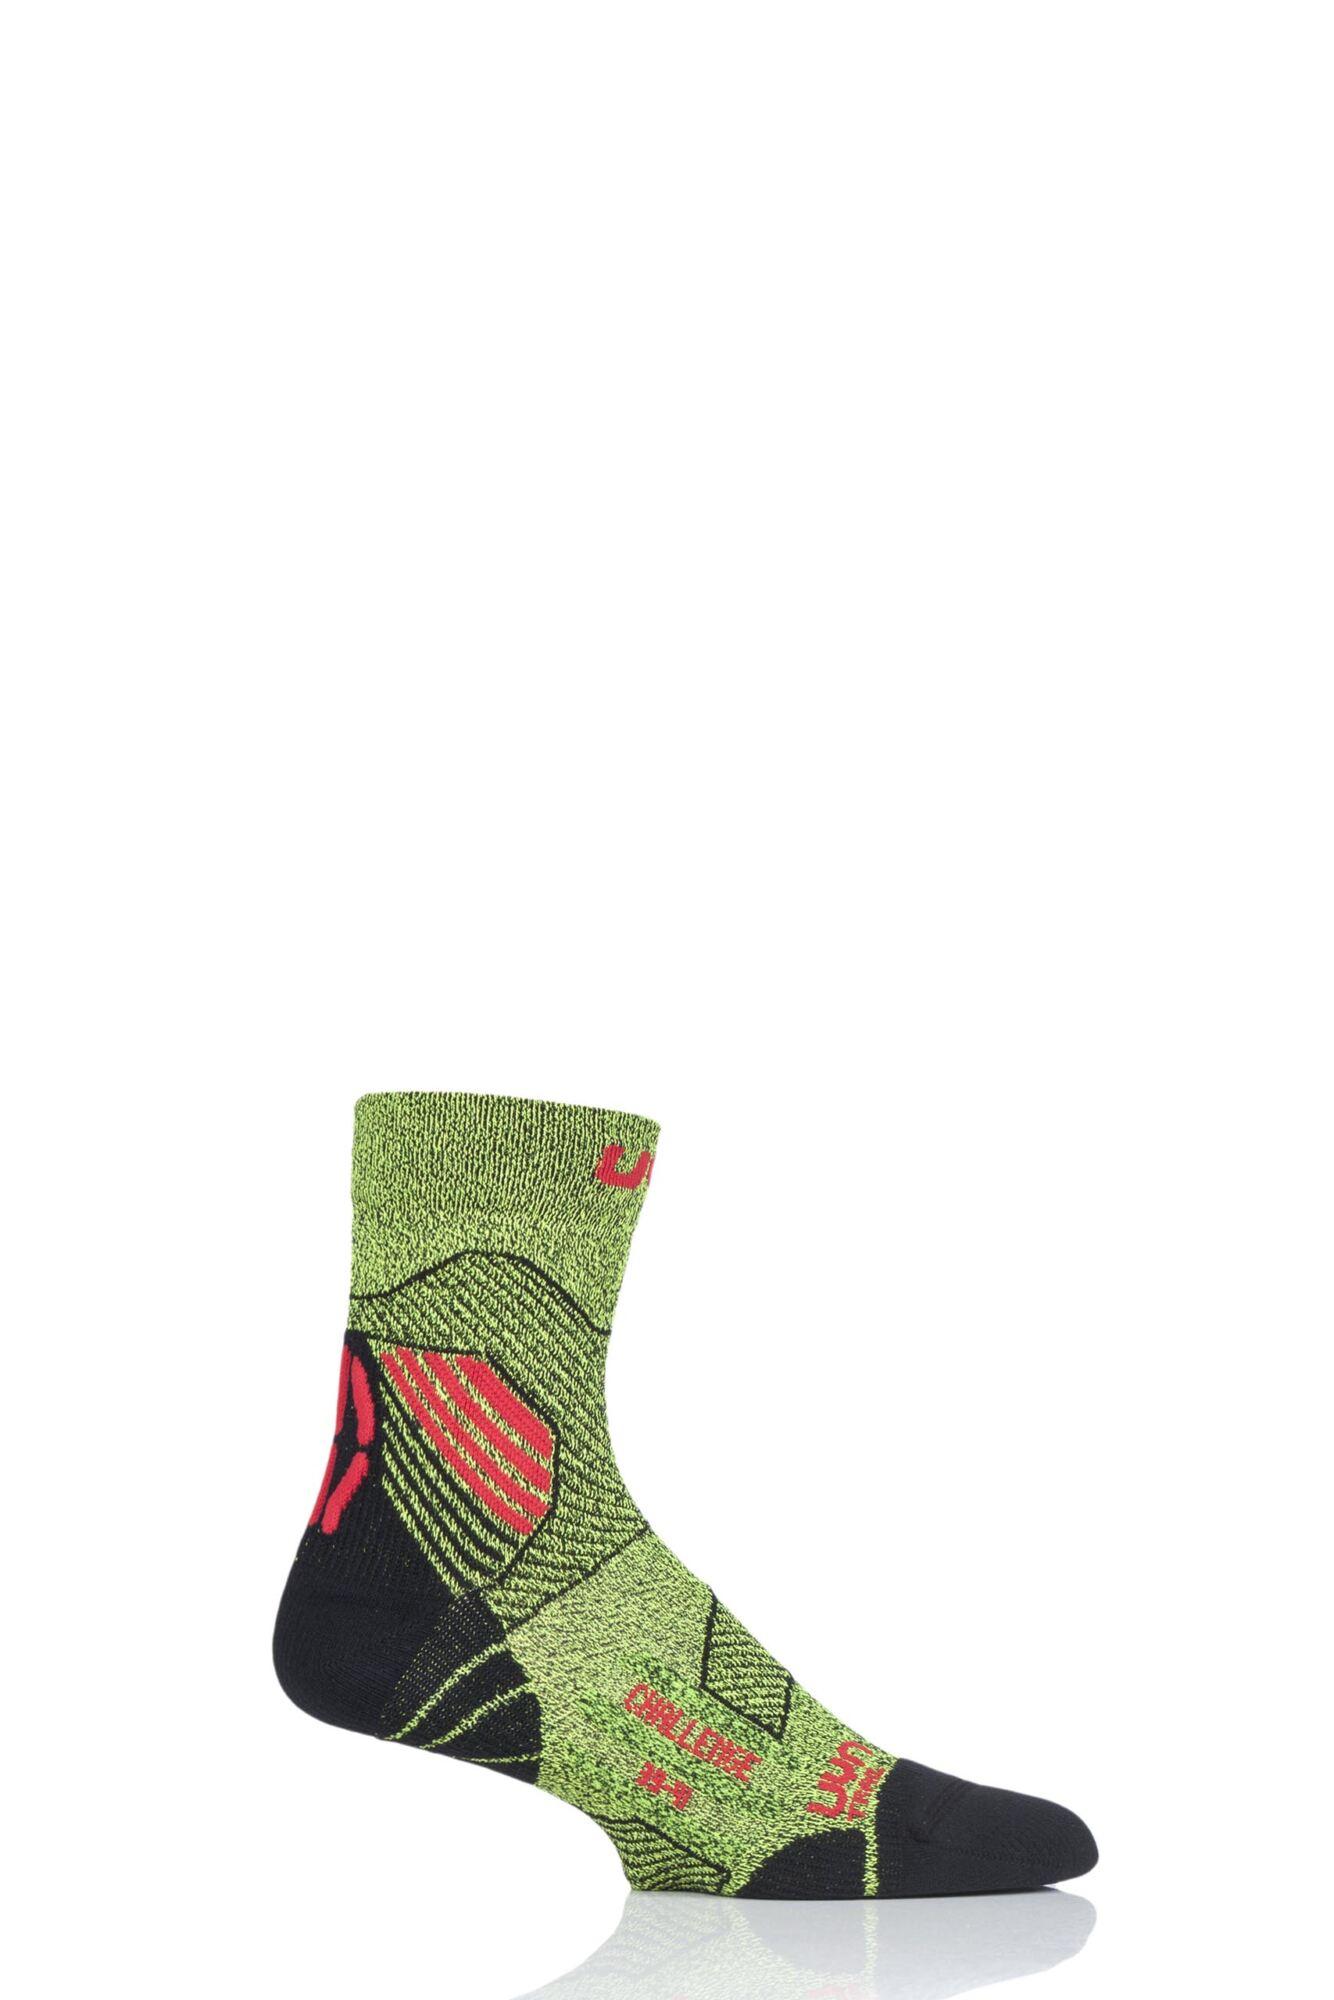 1 Pair Run Trail Challenge Socks Men's - Uyn